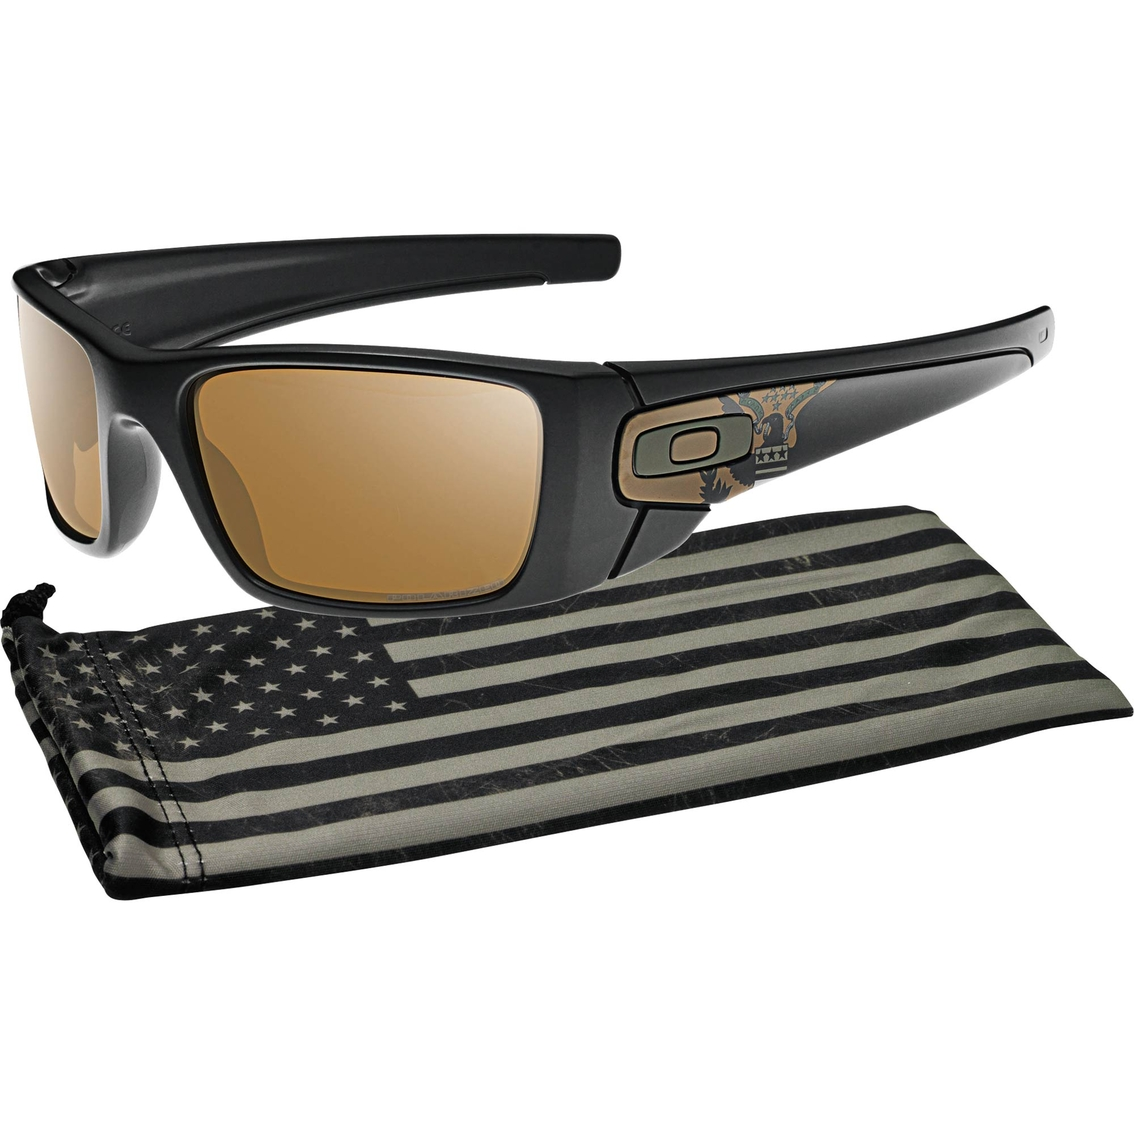 Oakley Fuel Cell Coyote Iridium Polarized Sunglasses